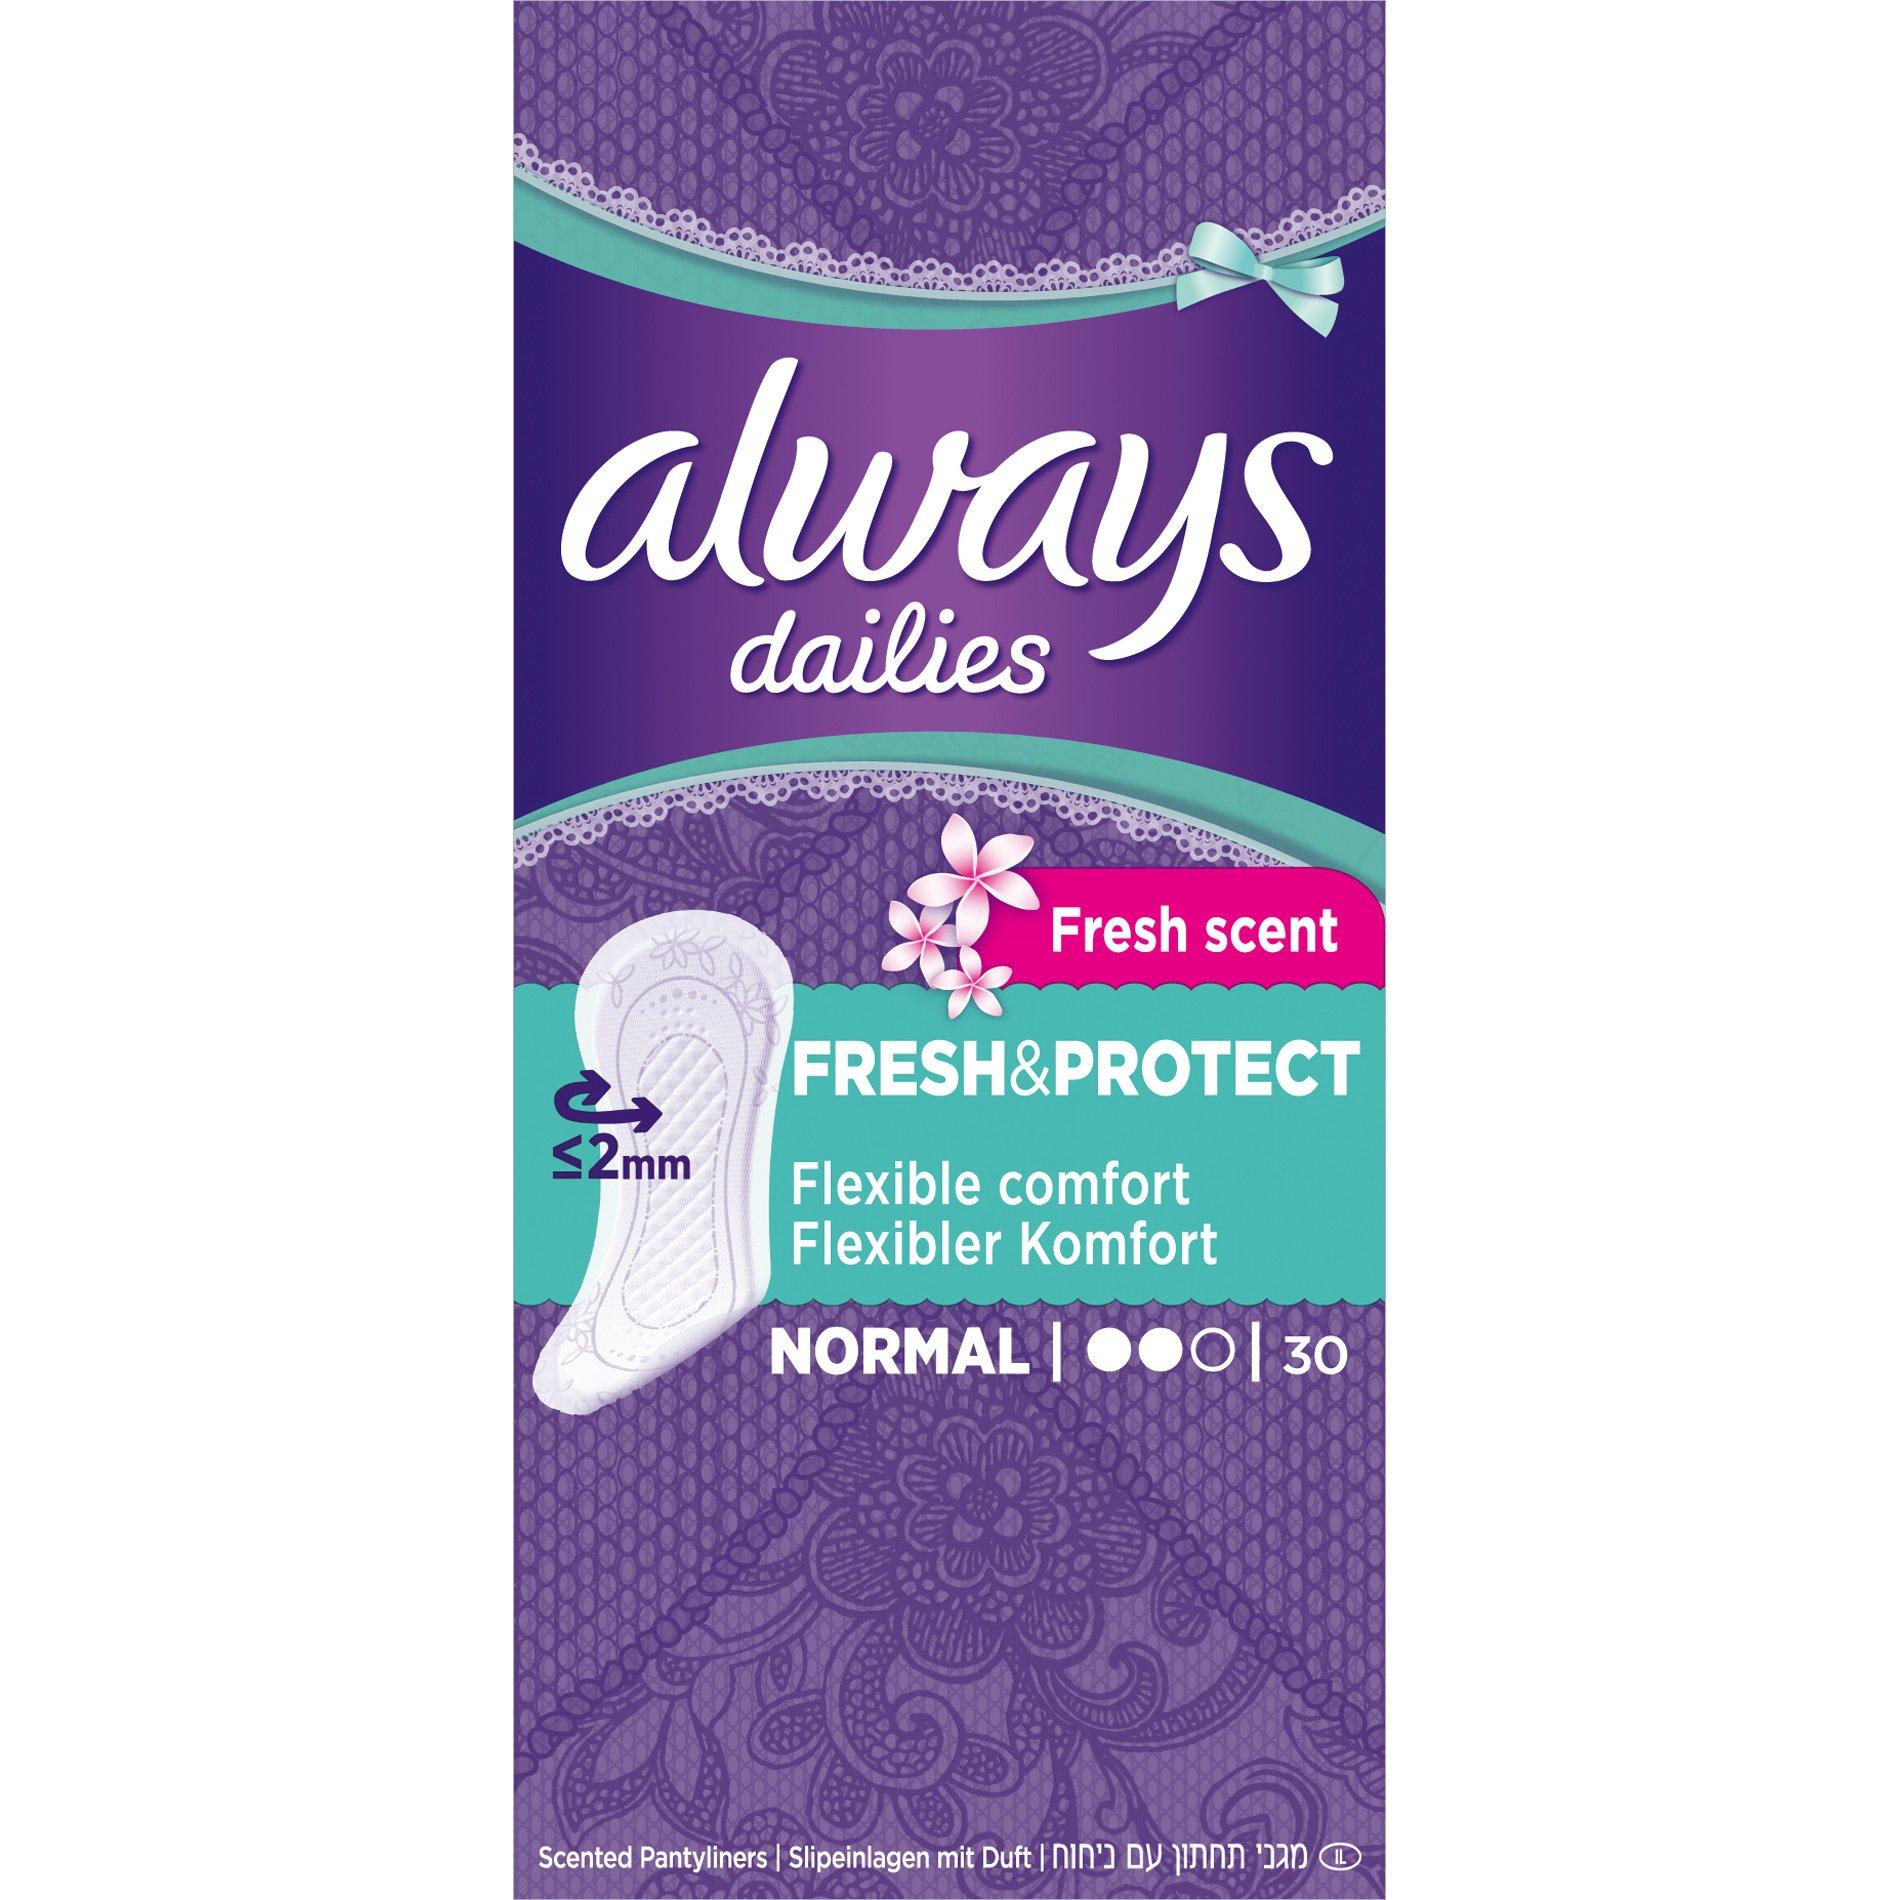 Always Dailies Fresh & Protect Normal Fresh Scent Σερβιετάκια με Άνετη Εφαρμογή Όλη Μέρα 30 τεμάχια